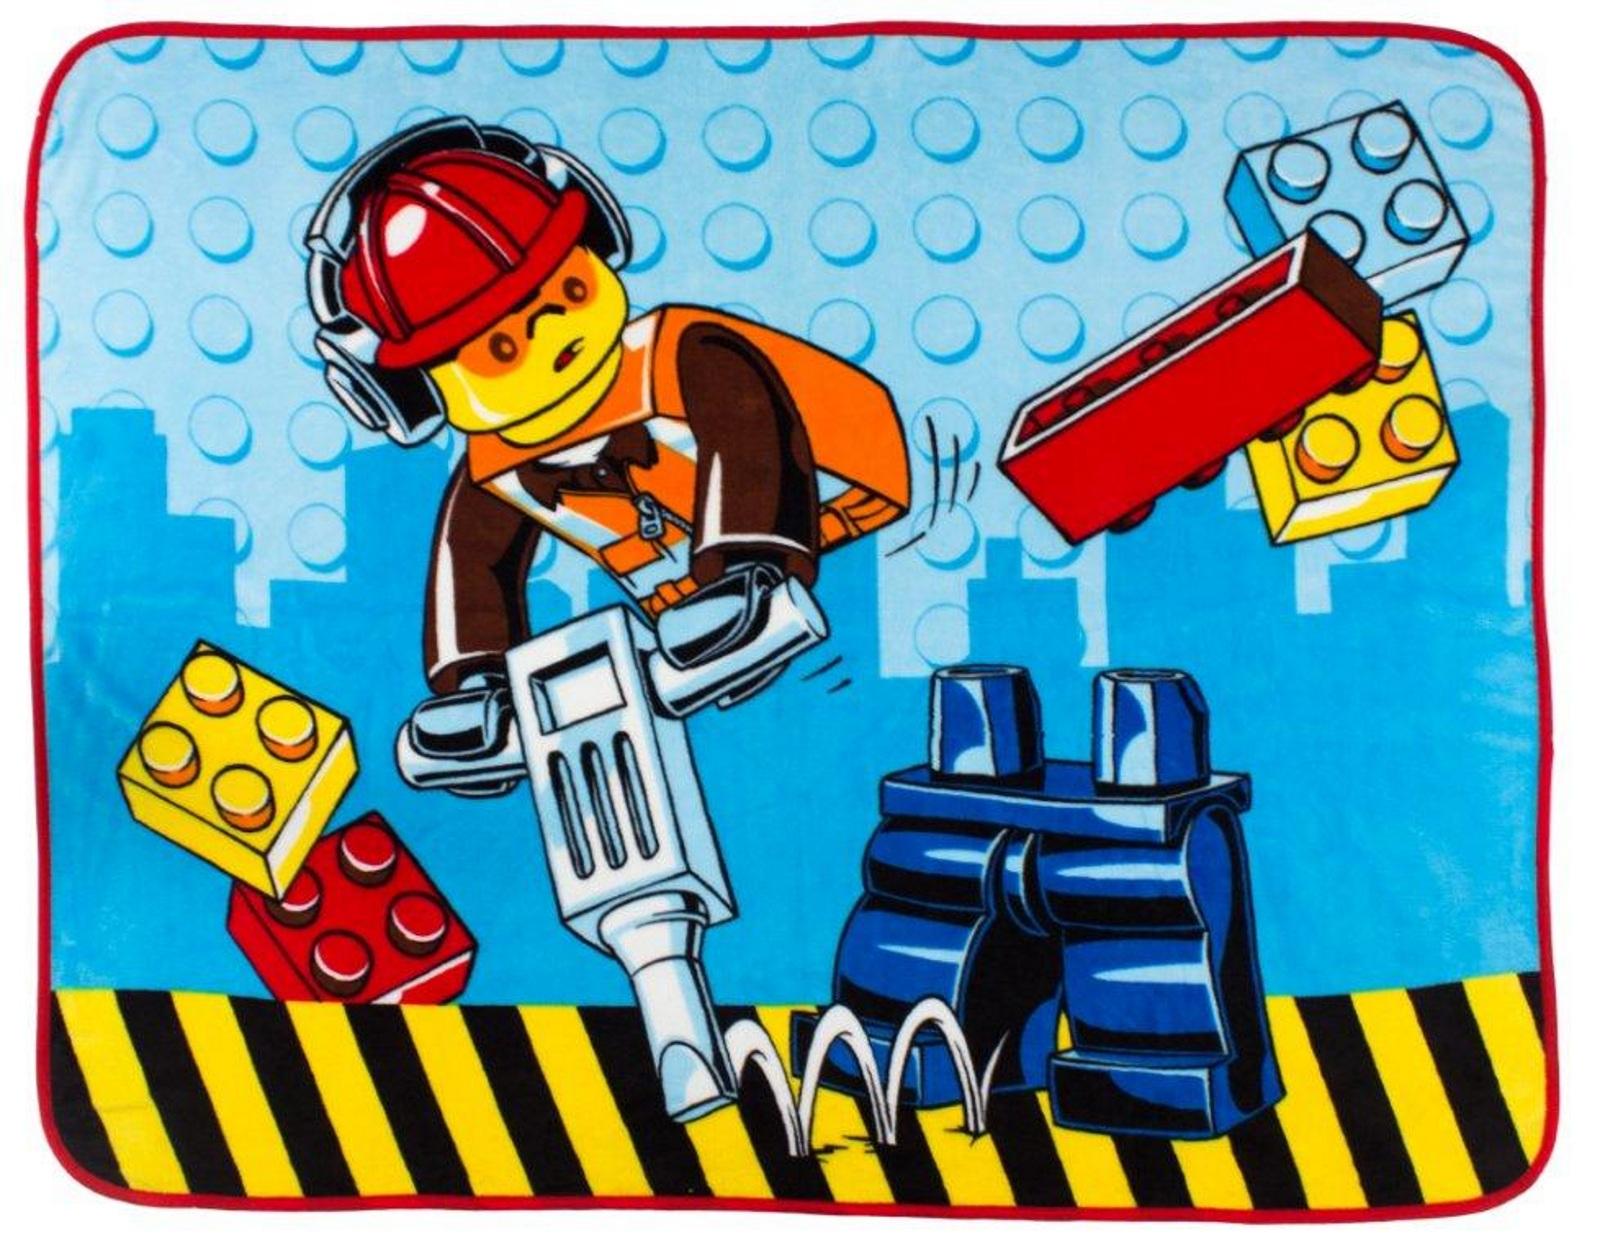 NEW LEGO CITY PREMIUM DESIGN CONSTRUCTION PANEL BLANKET